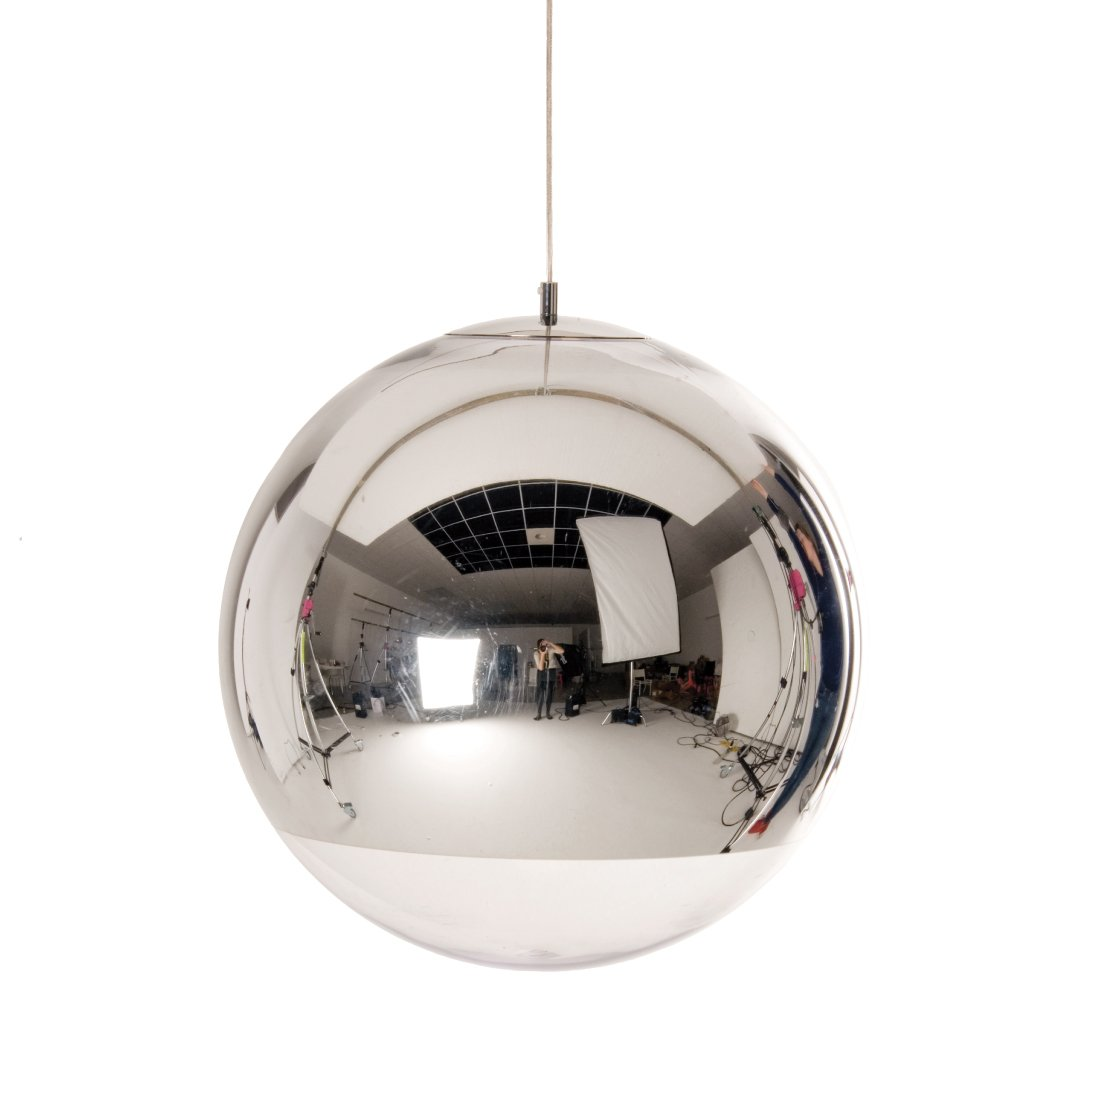 Tom Dixon Mirror Ball Hanglamp � 50 cm